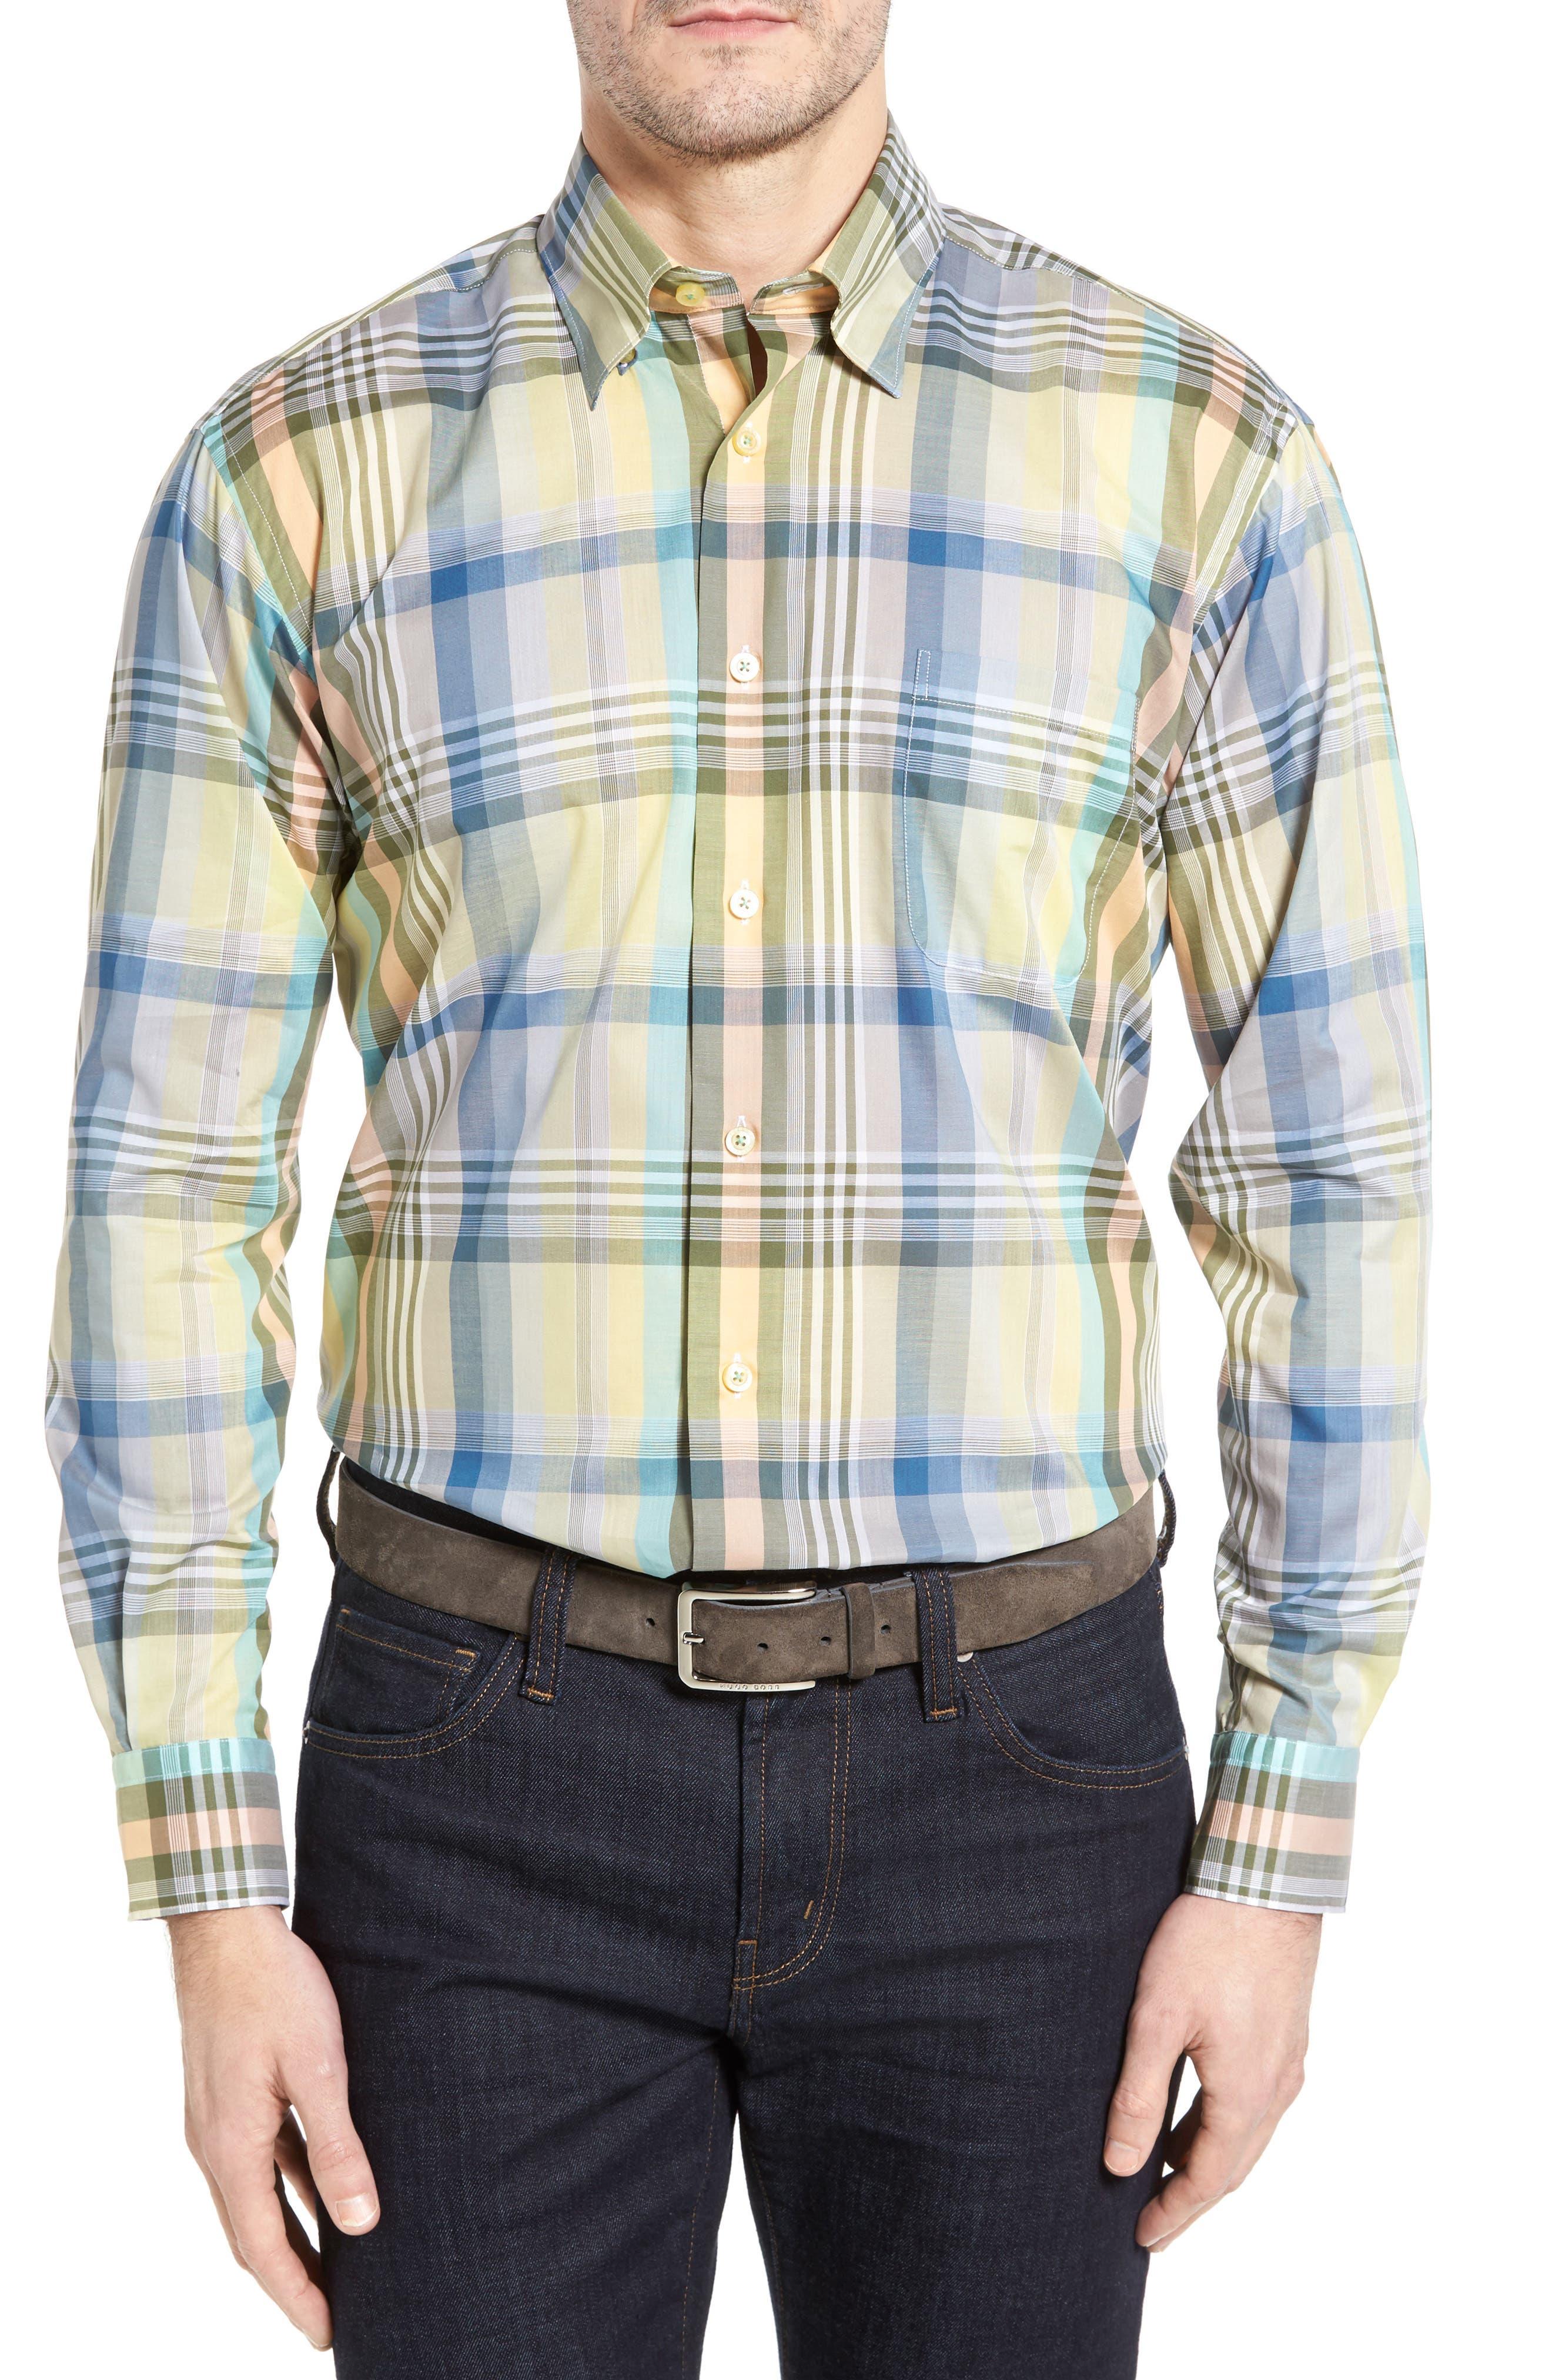 Anderson Classic Fit Plaid Sport Shirt,                             Main thumbnail 1, color,                             960